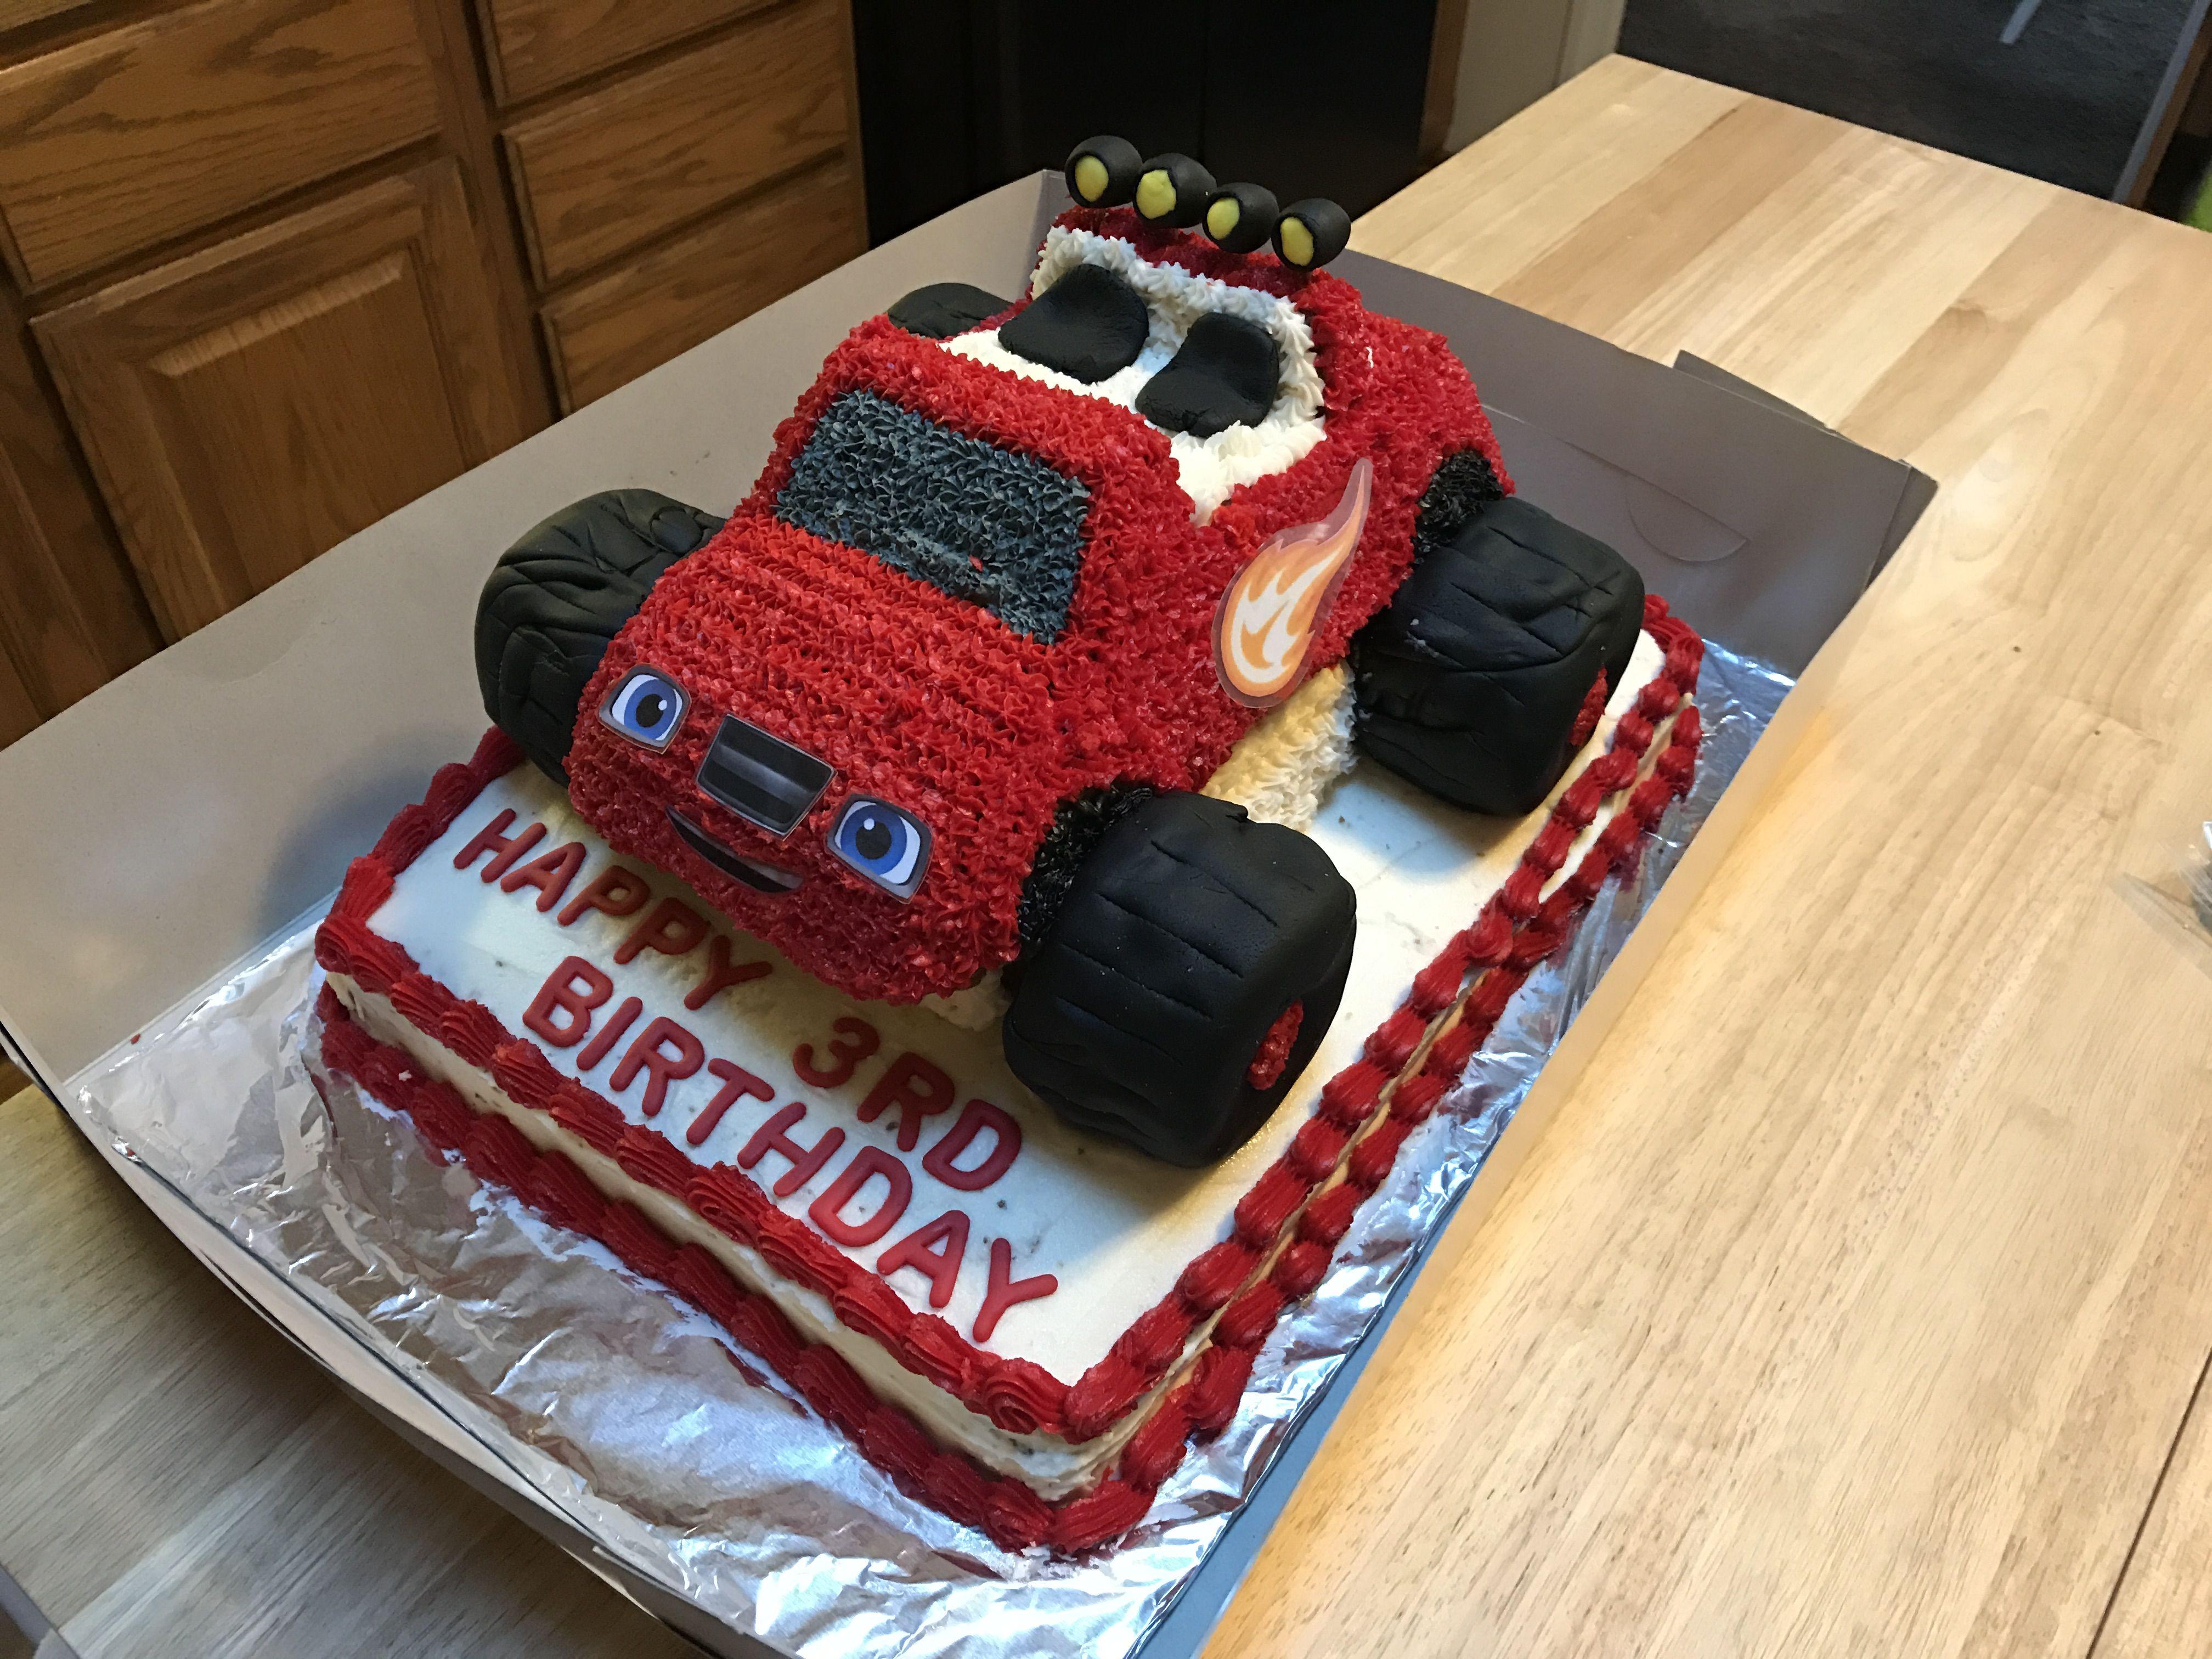 blaze and the monster machine cupcake cake cook u0027s creations